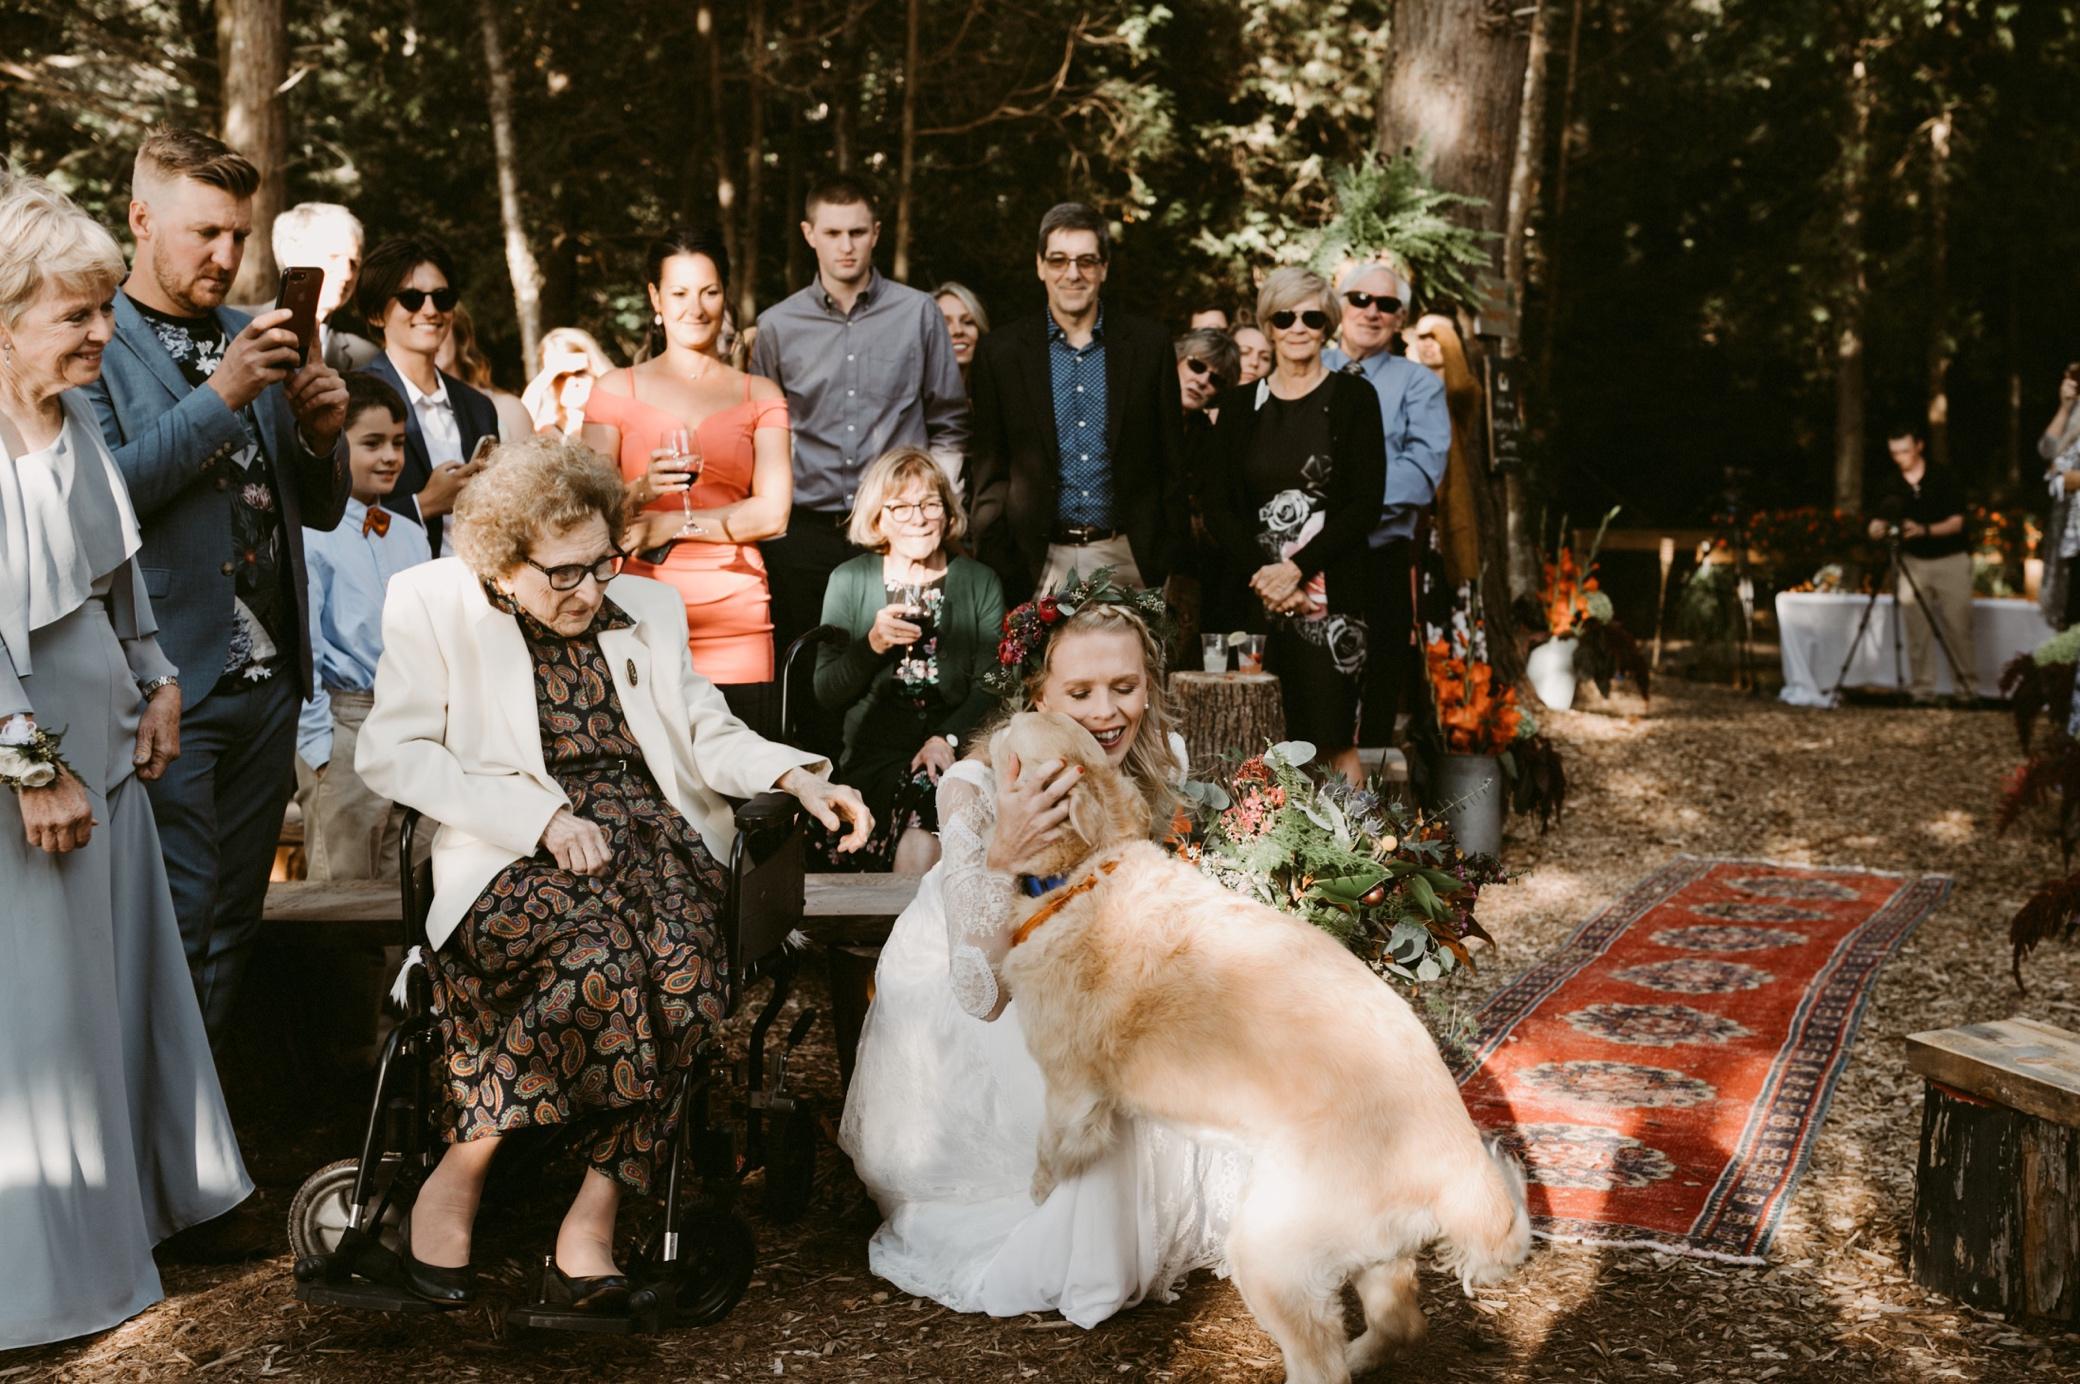 089_Huntsville Wedding  (408 of 689)_Documentary_WOntario_photographer_Algonquin_Huntsville_Northern_Wedding.jpg